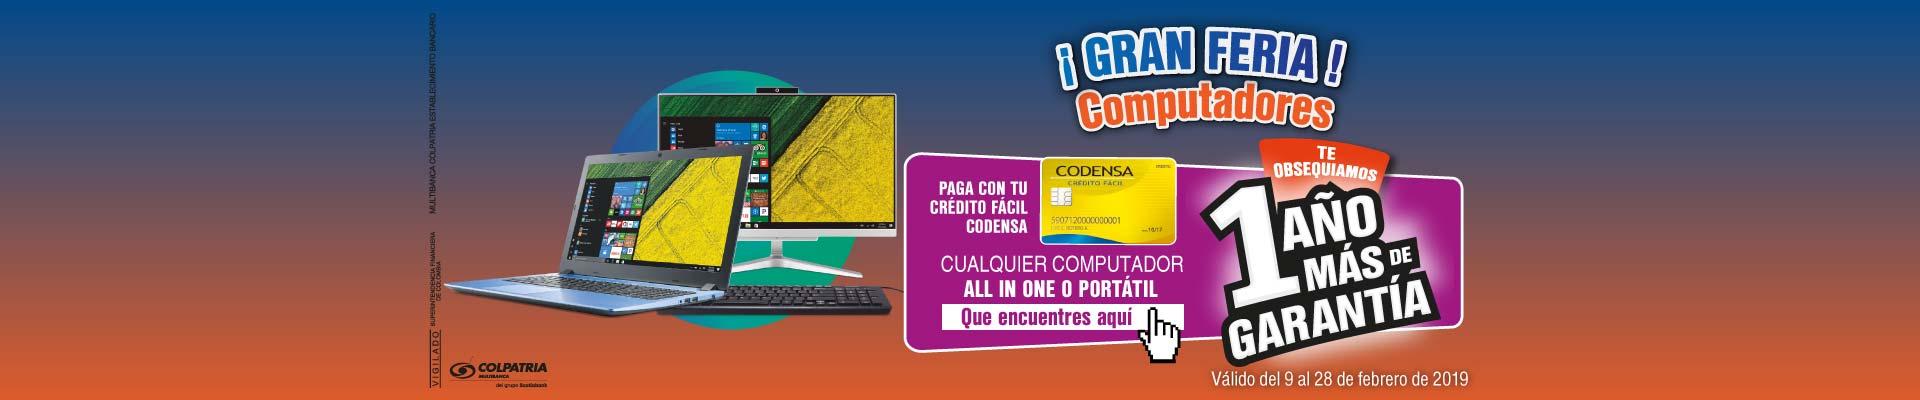 AK-PPAL-1-computadores y tablets-PP-Banner Garantia Extendida_feb08